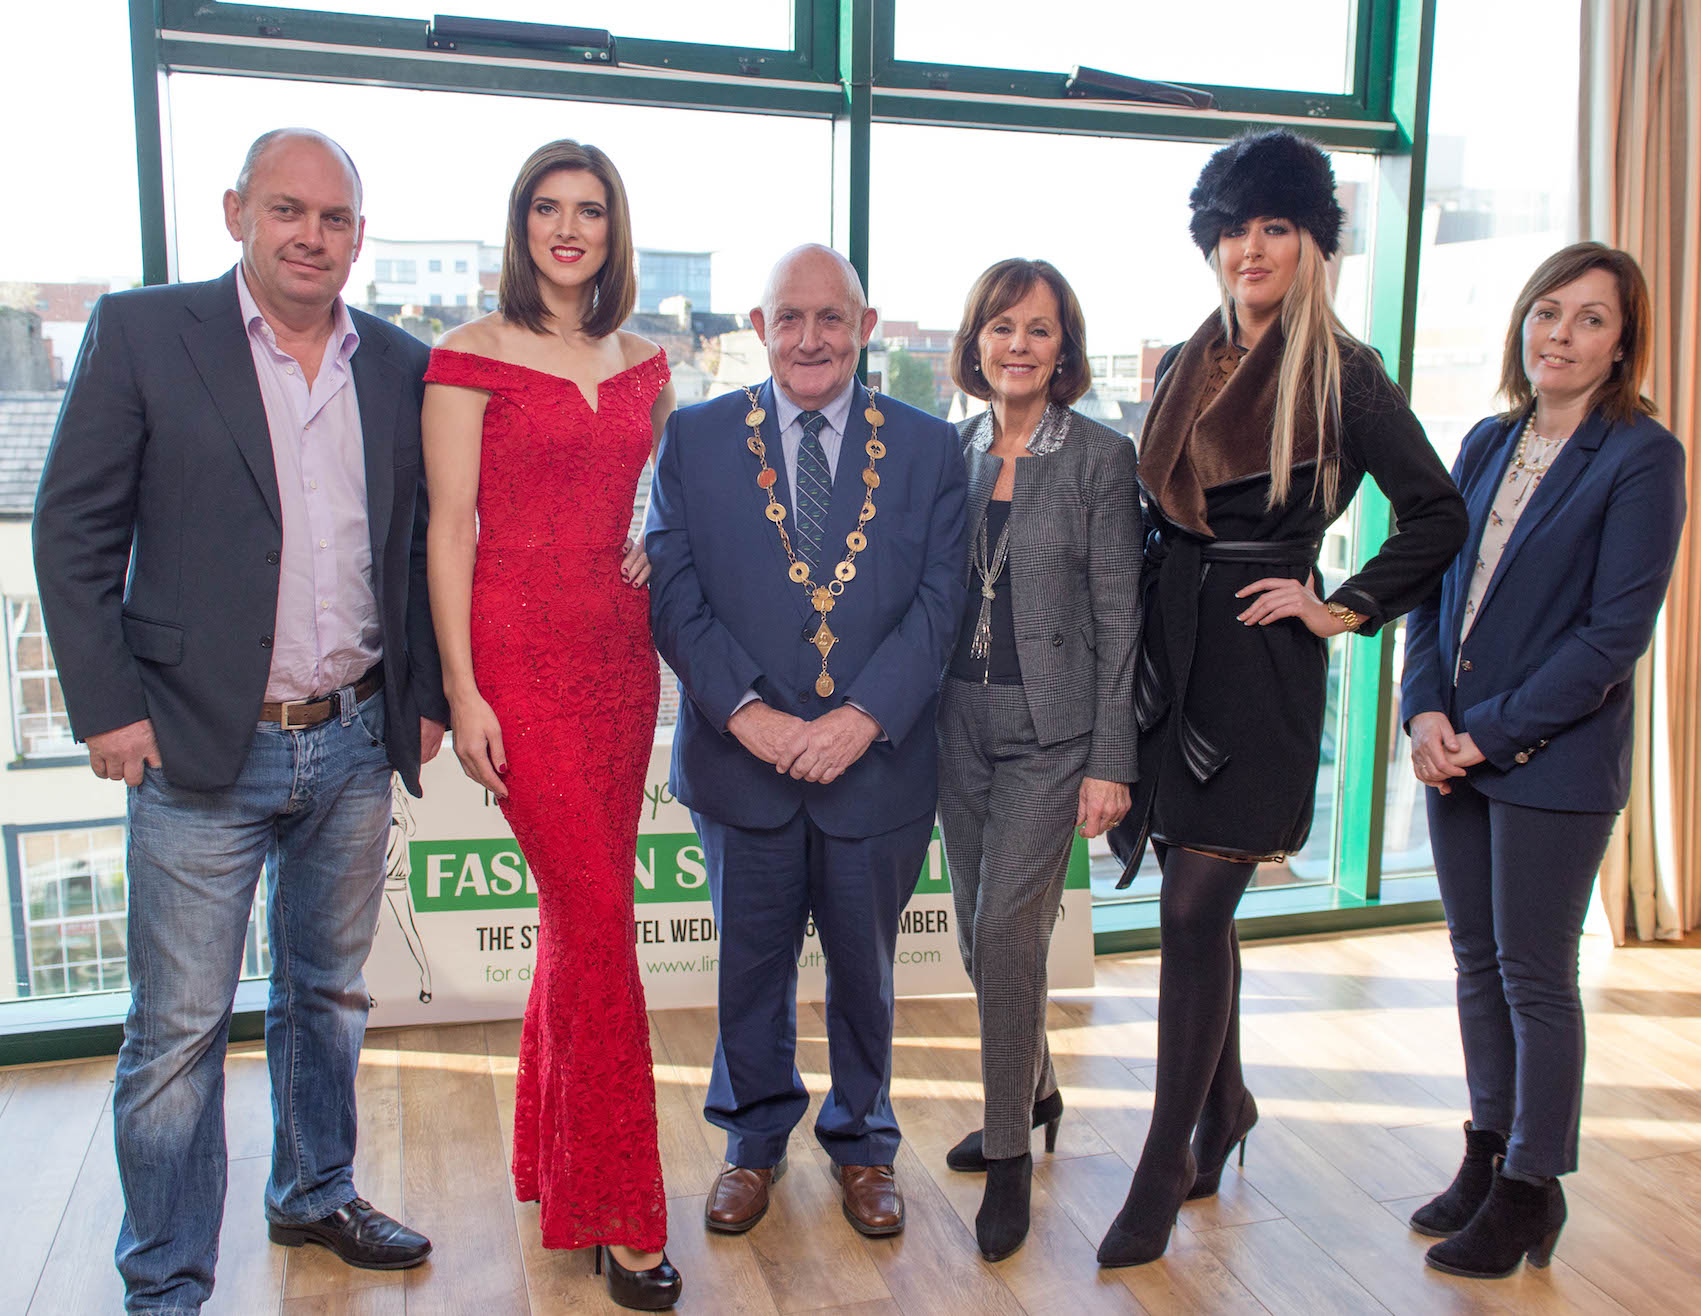 Limerick Youth Service Fashion Show 2016